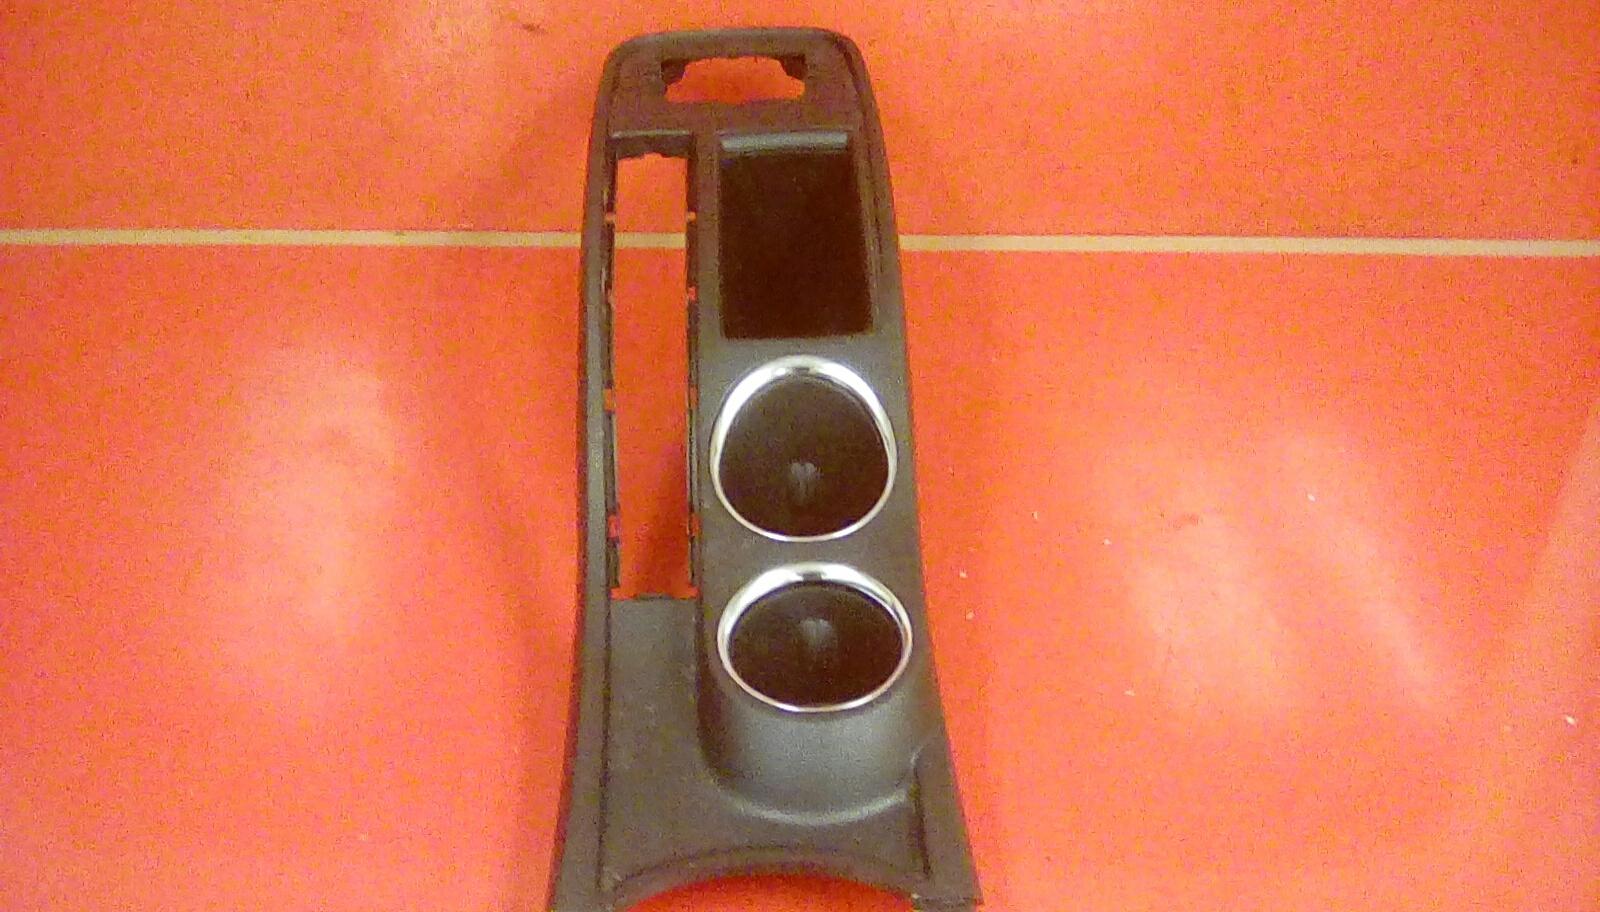 B0B Vauxhall Zafira Tourer Fuse Box   Wiring Resources on vauxhall adam, vauxhall insignia tourer, hyundai i30 tourer, vauxhall cascada, honda accord tourer, vauxhall el camino, vauxhall vx220, vauxhall tigra, vauxhall astra sports tourer, toyota avensis tourer, vauxhall meriva,